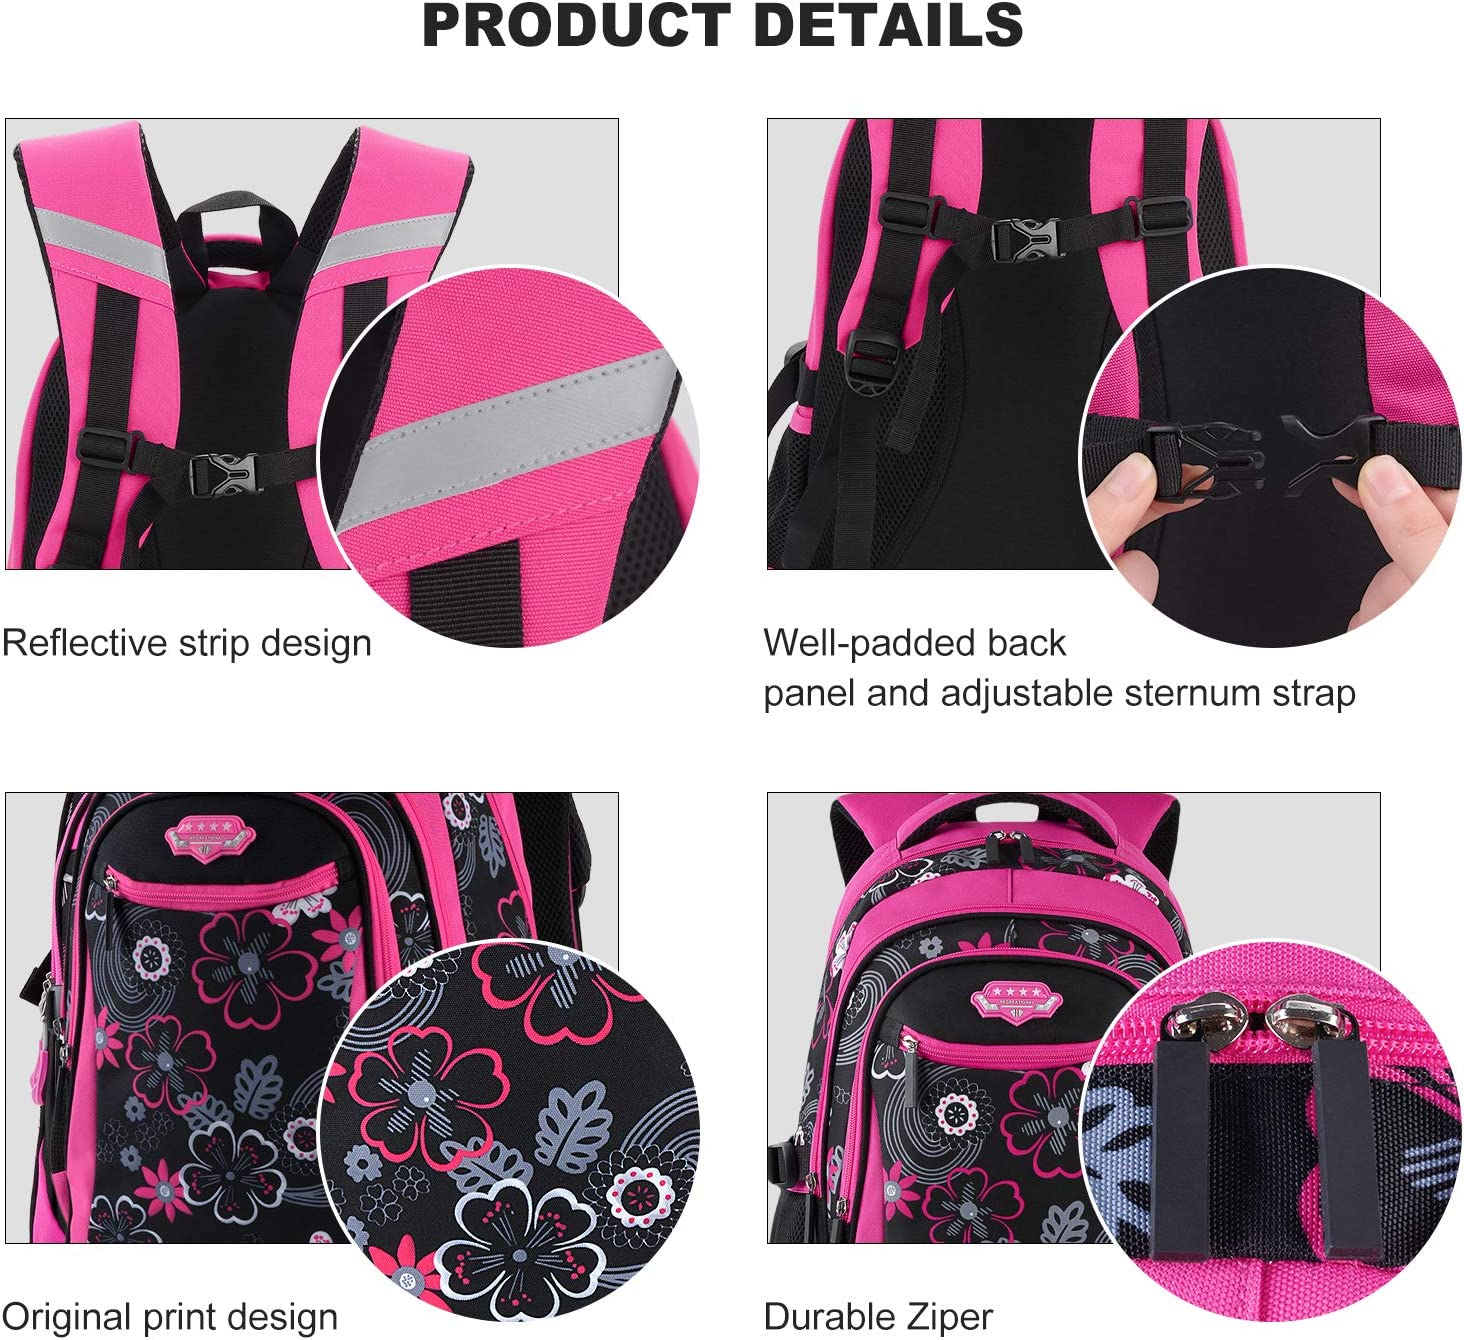 Rolling Backpack for Girls, Fanspack Wheeled Backpack for Girls Backpack with Wheels Rolling Backpack for School